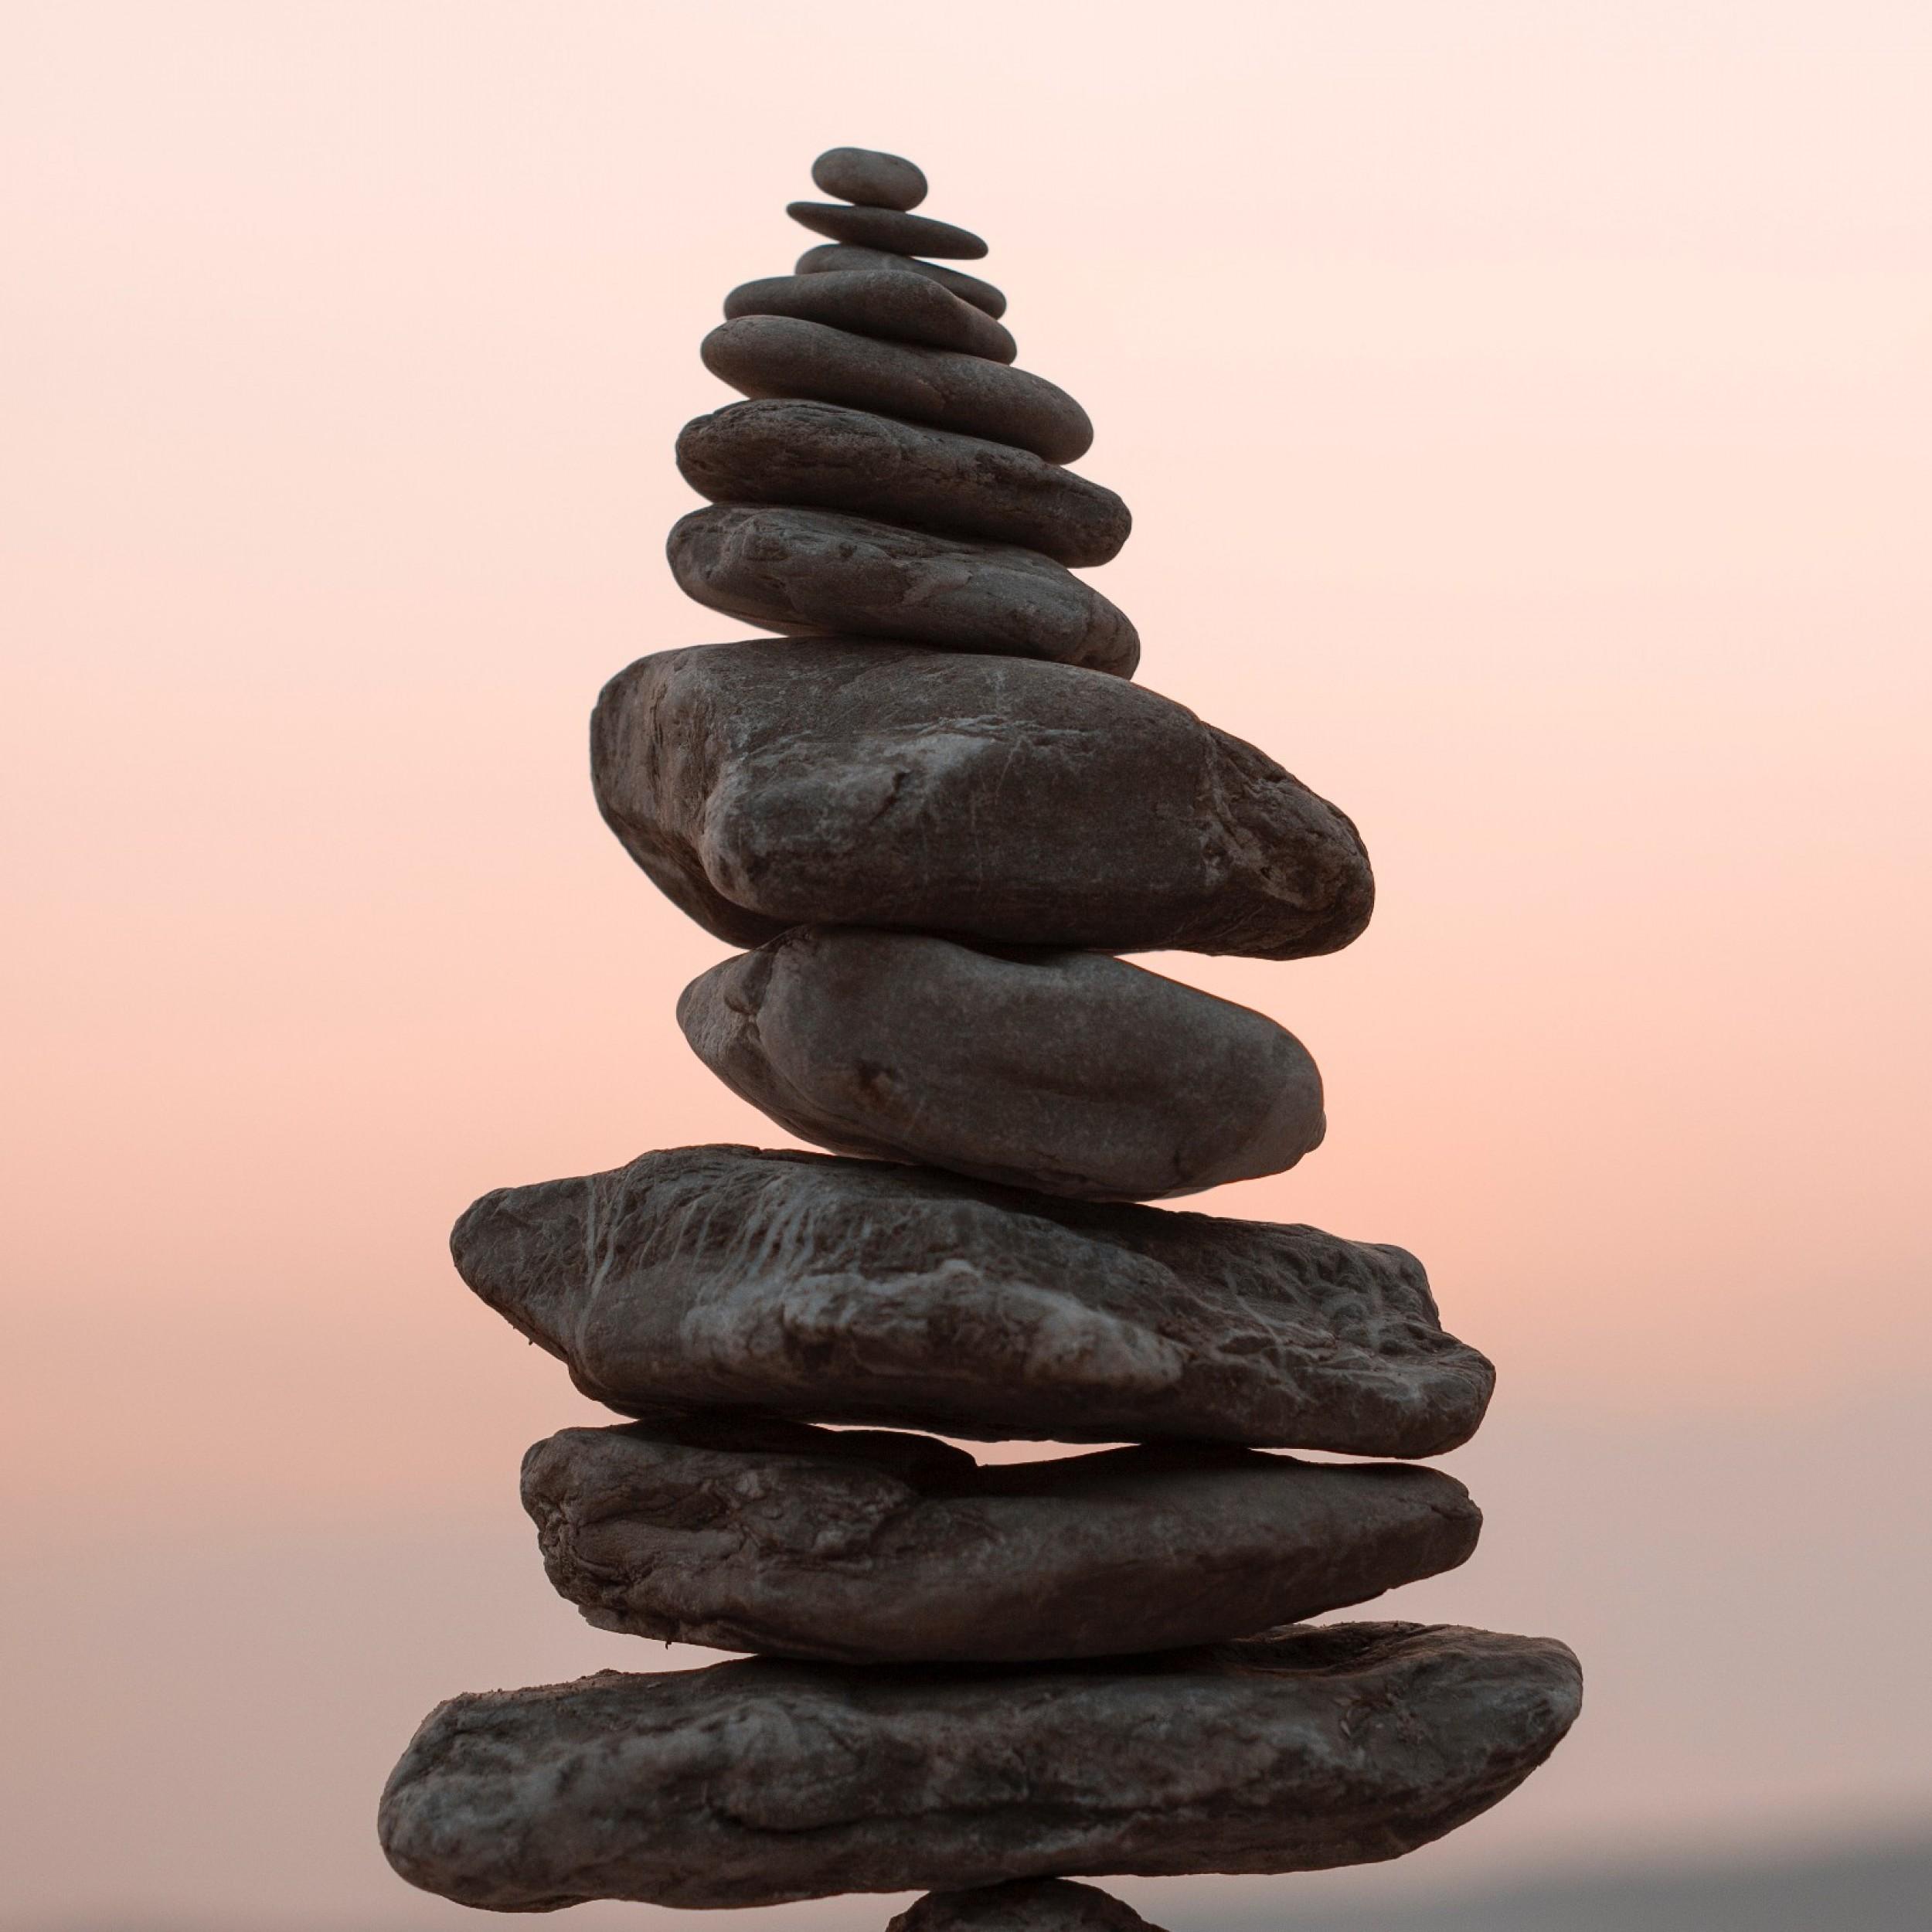 Yoga for Back Health